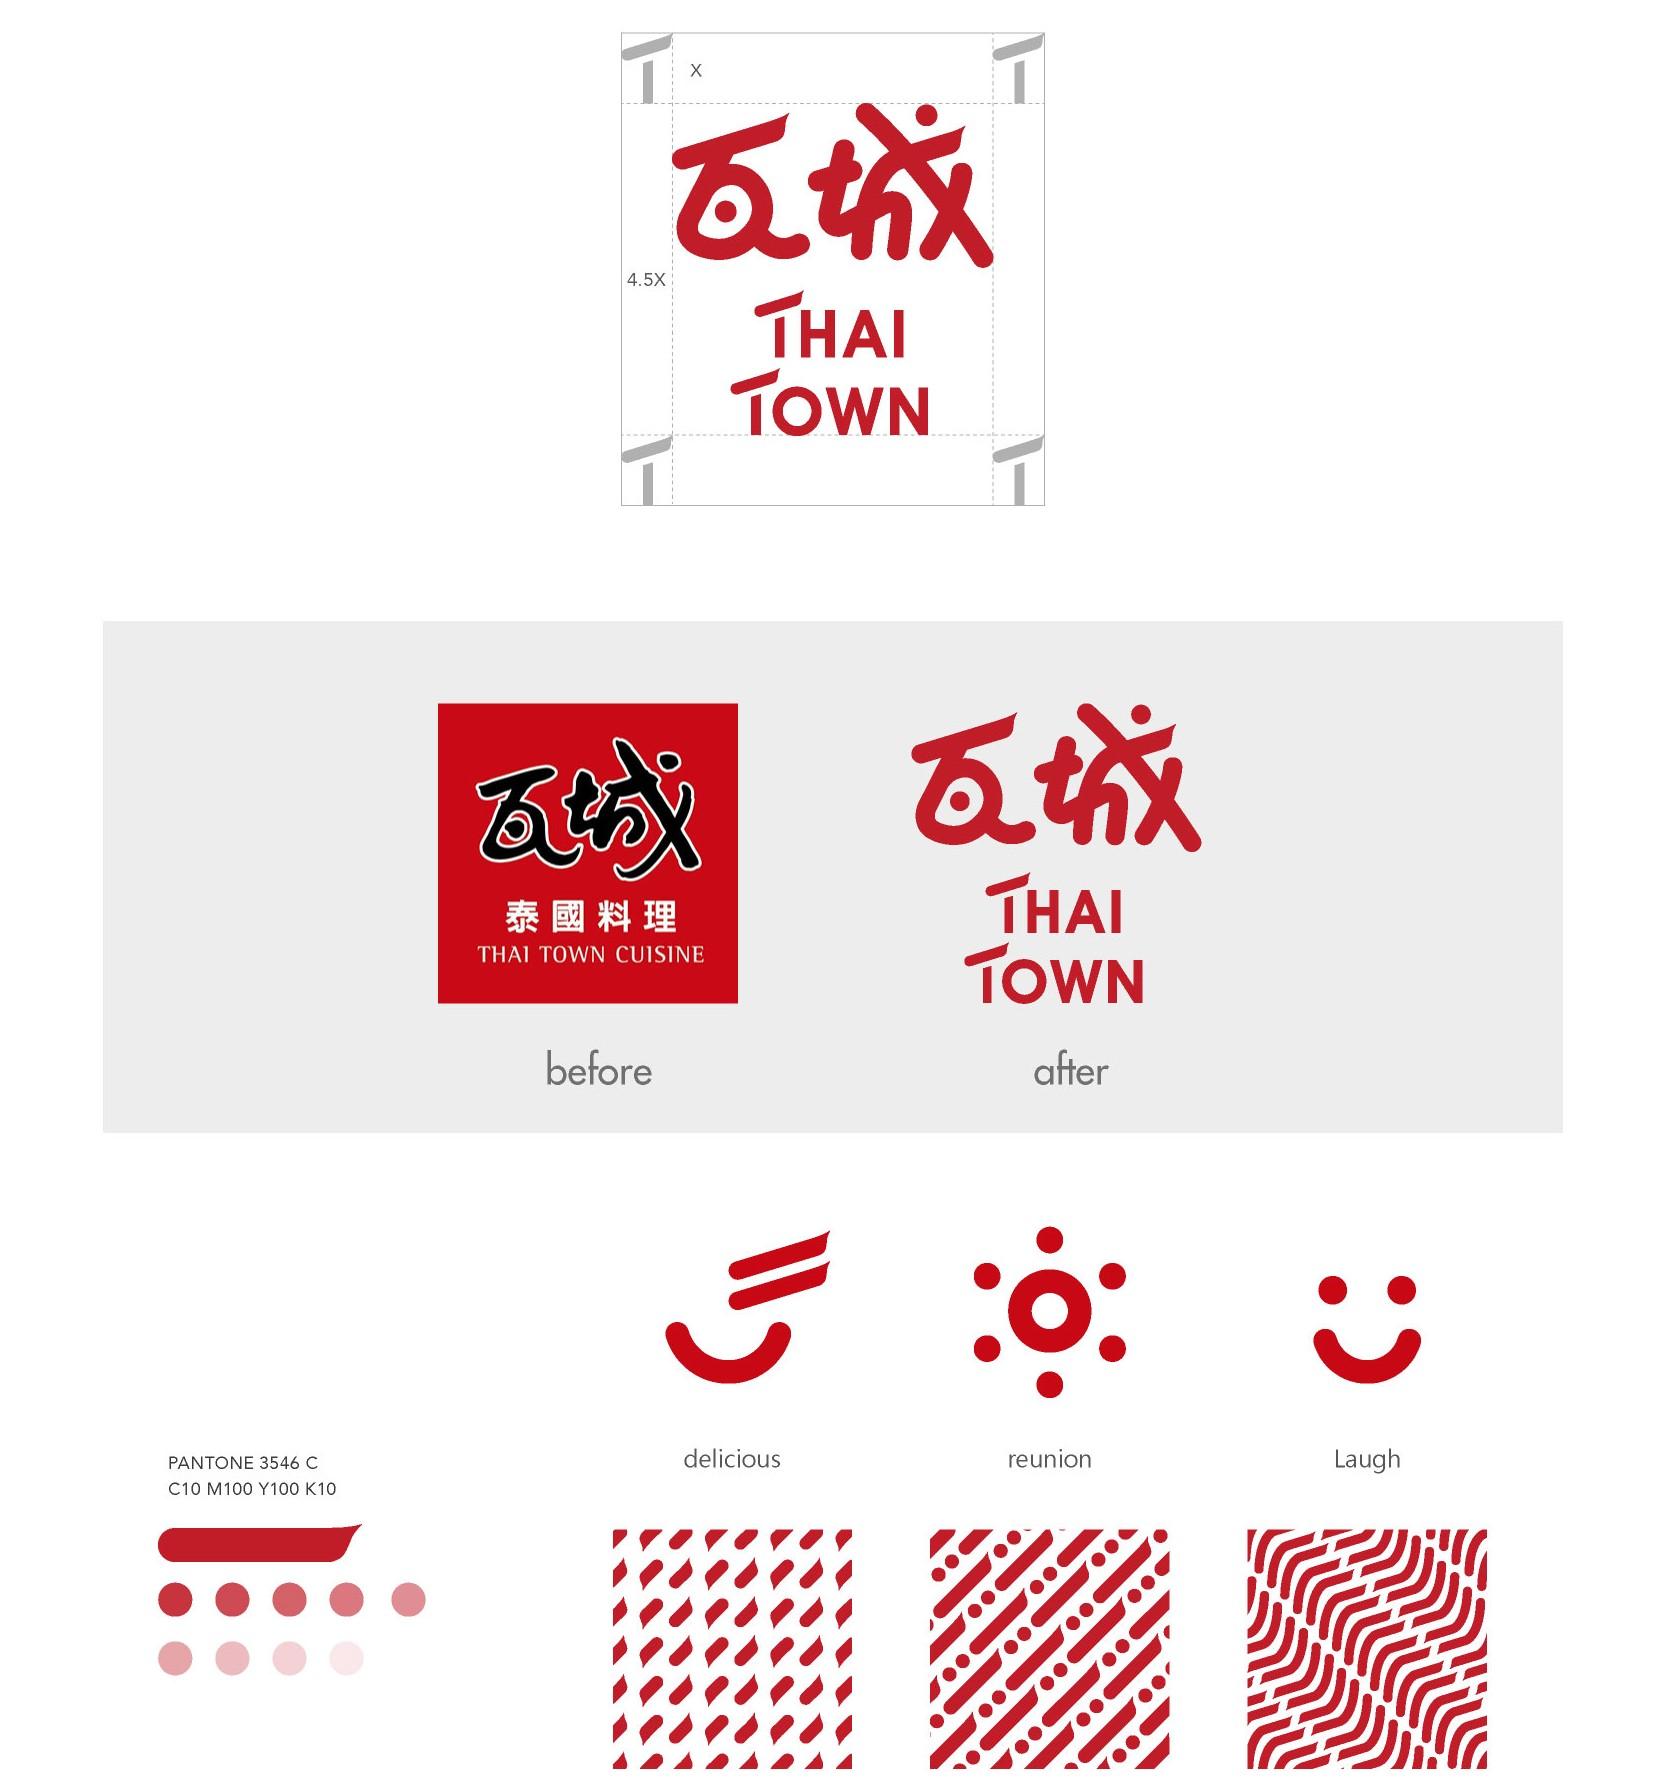 THAI TOWN 瓦城 品牌形象重整規劃設計